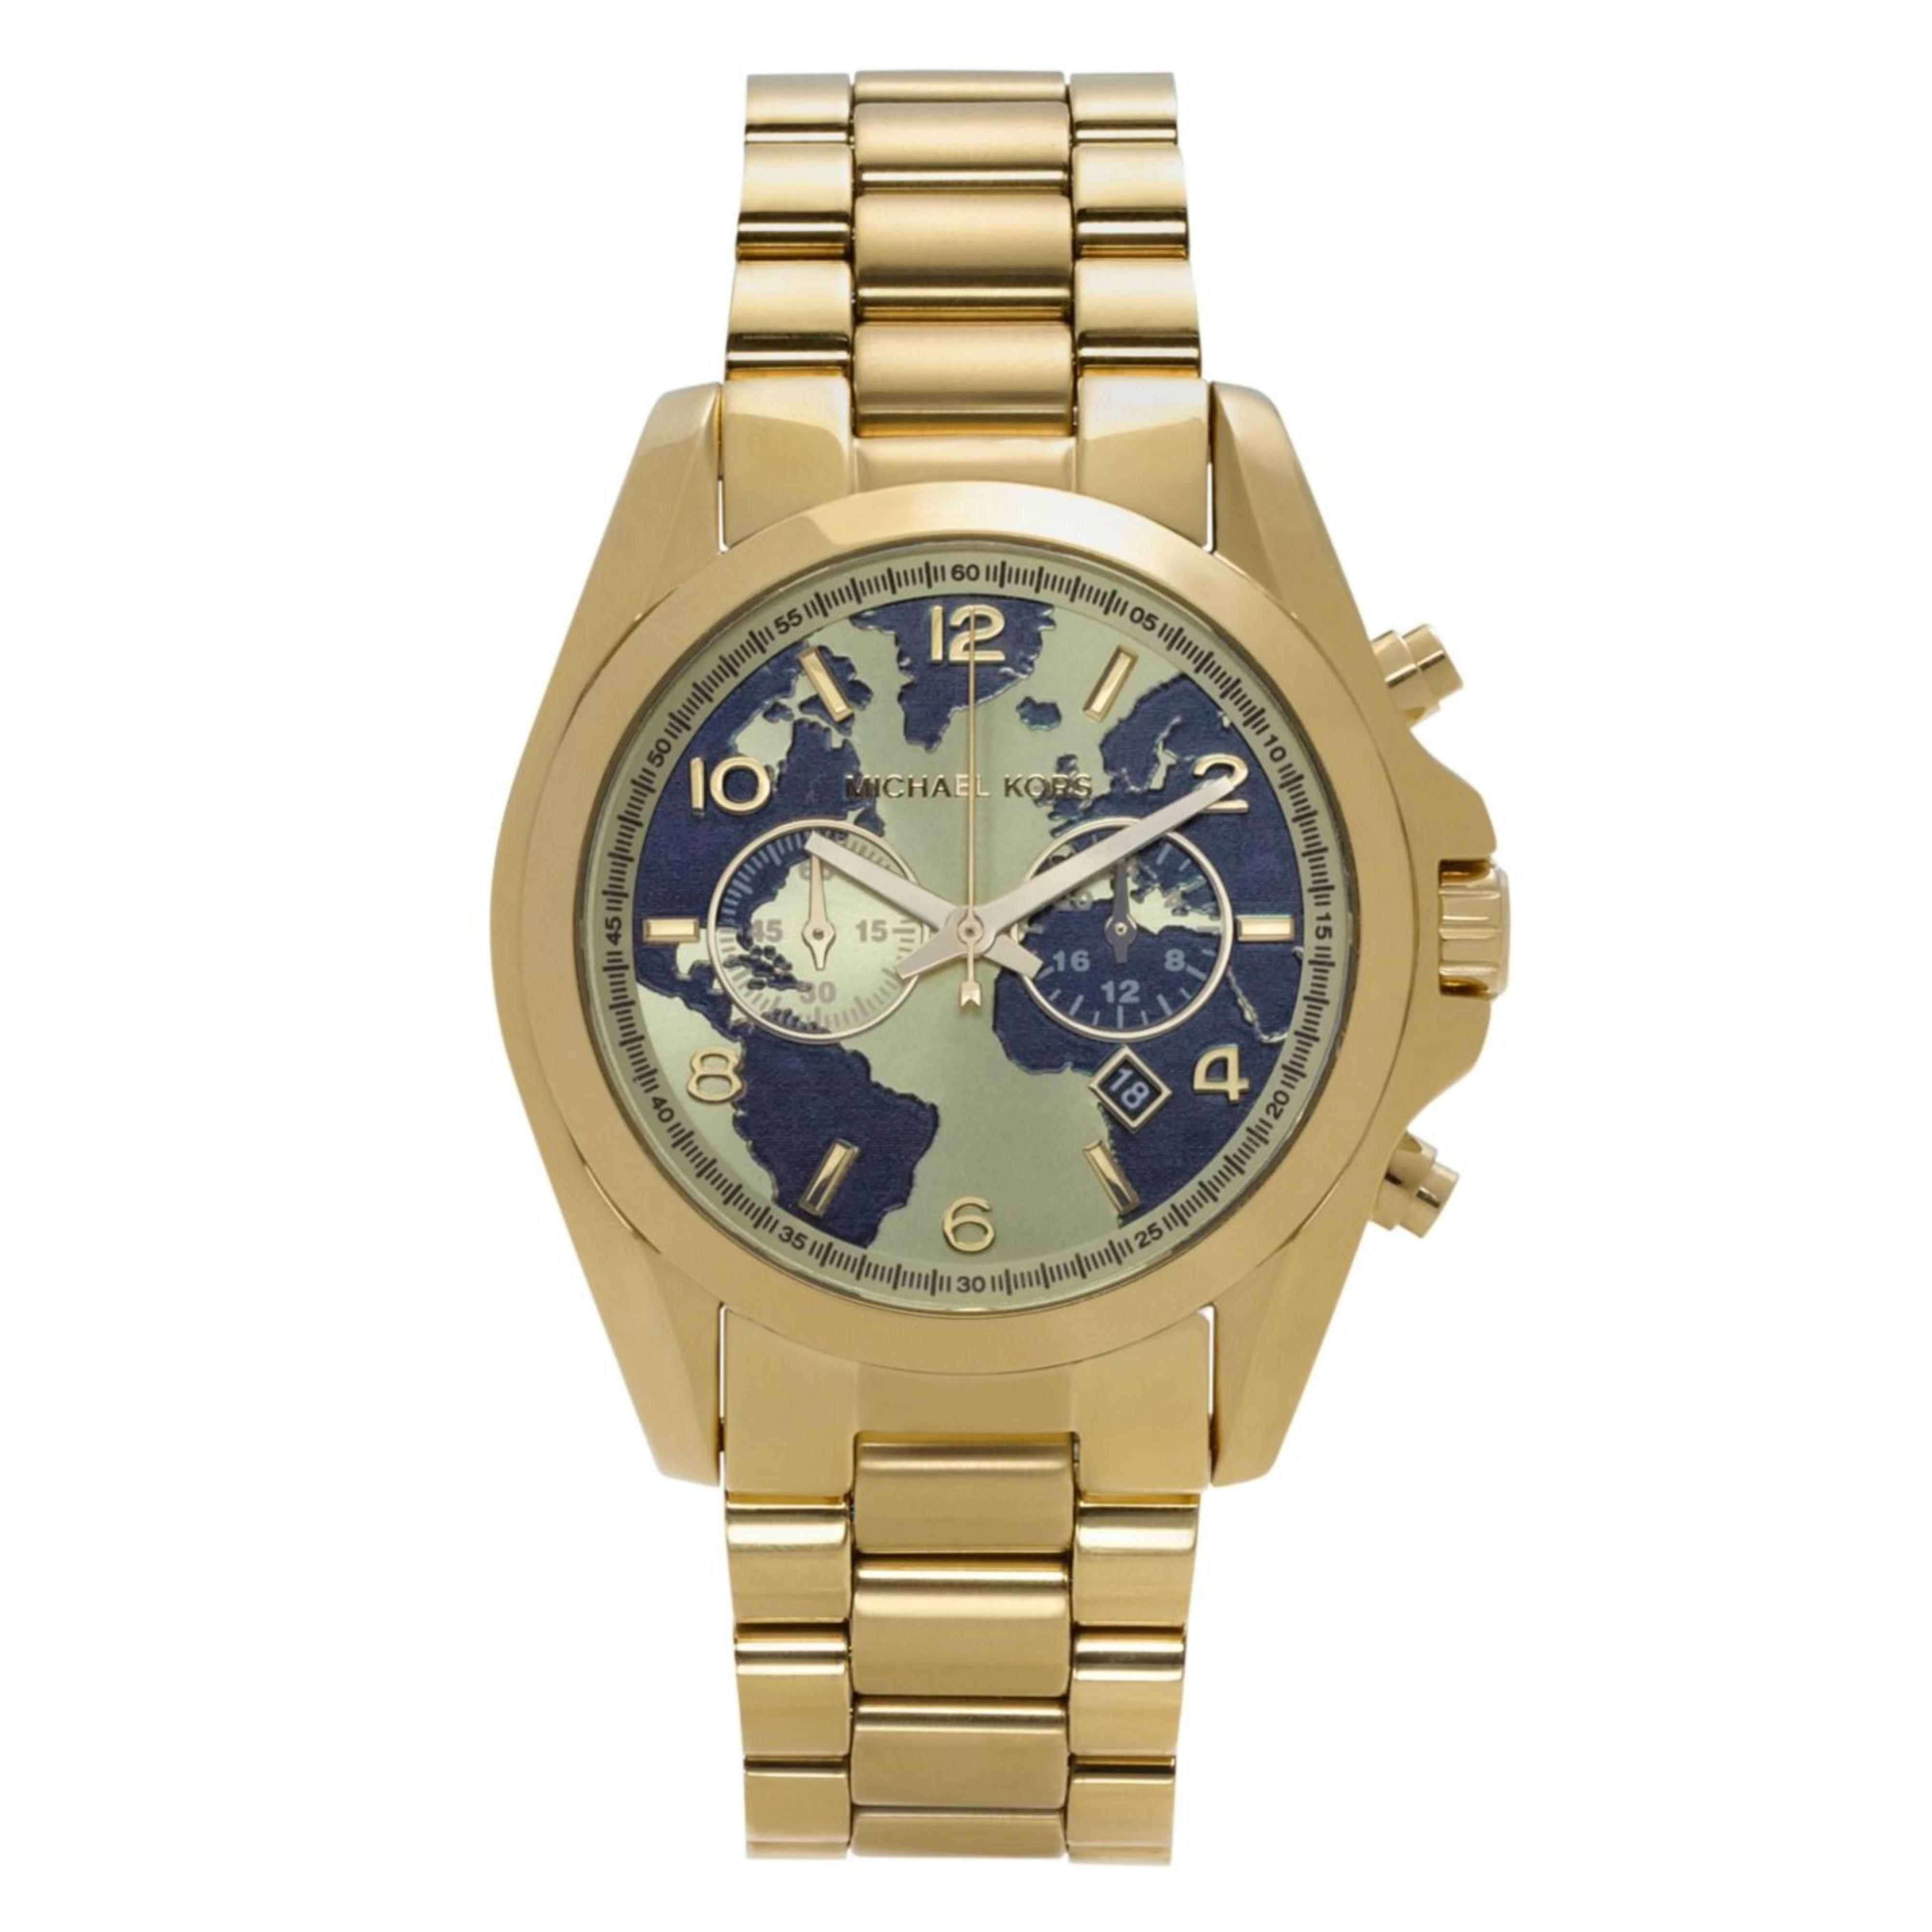 Michael Kors Hunger Stop Bradshaw Watch|Round Dial|Gold Tone Bracelet Band|6272